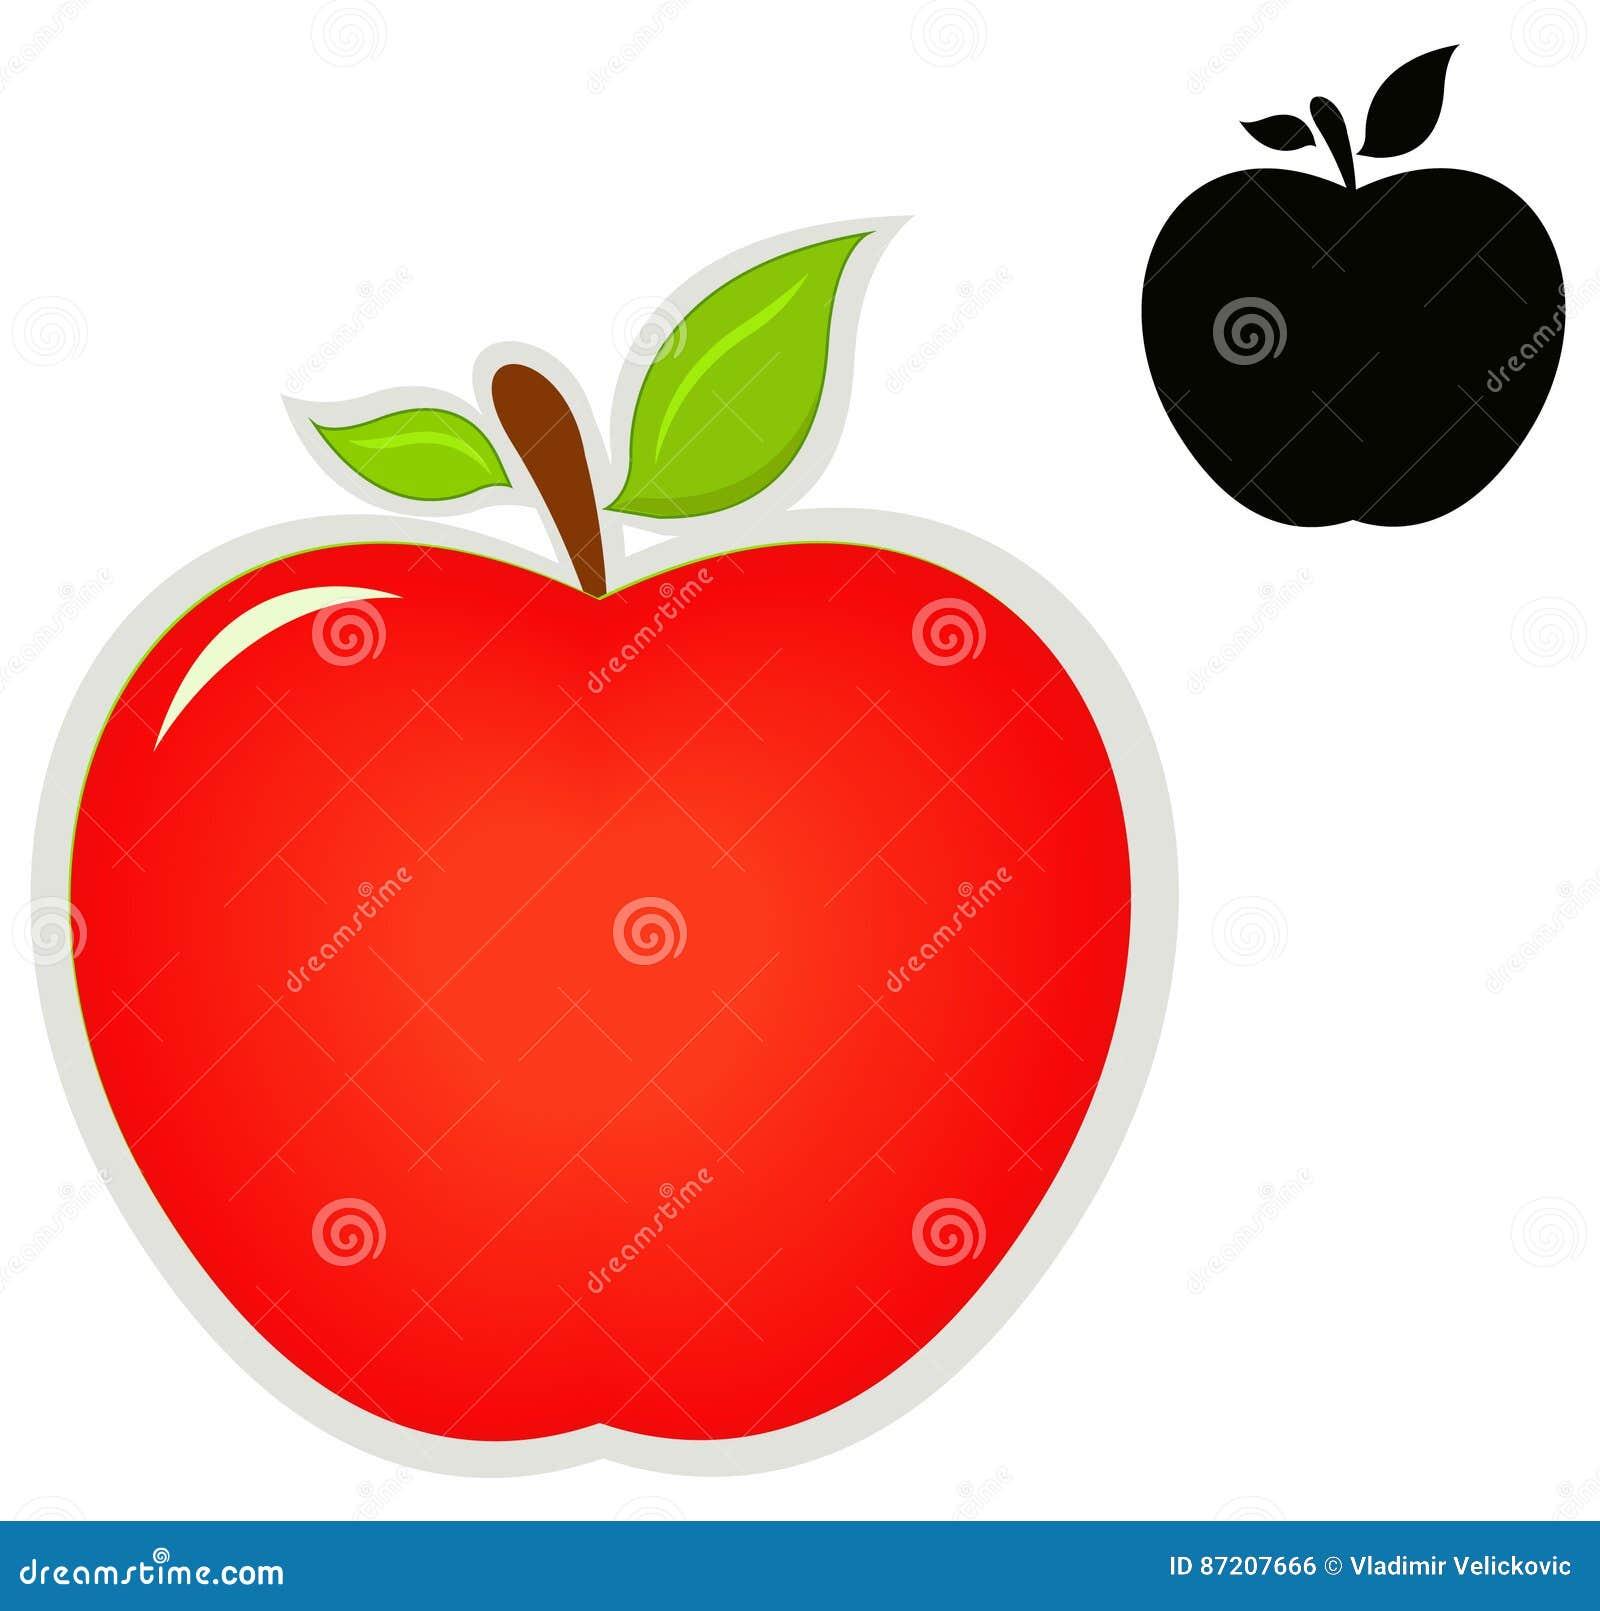 Apple-Ikone